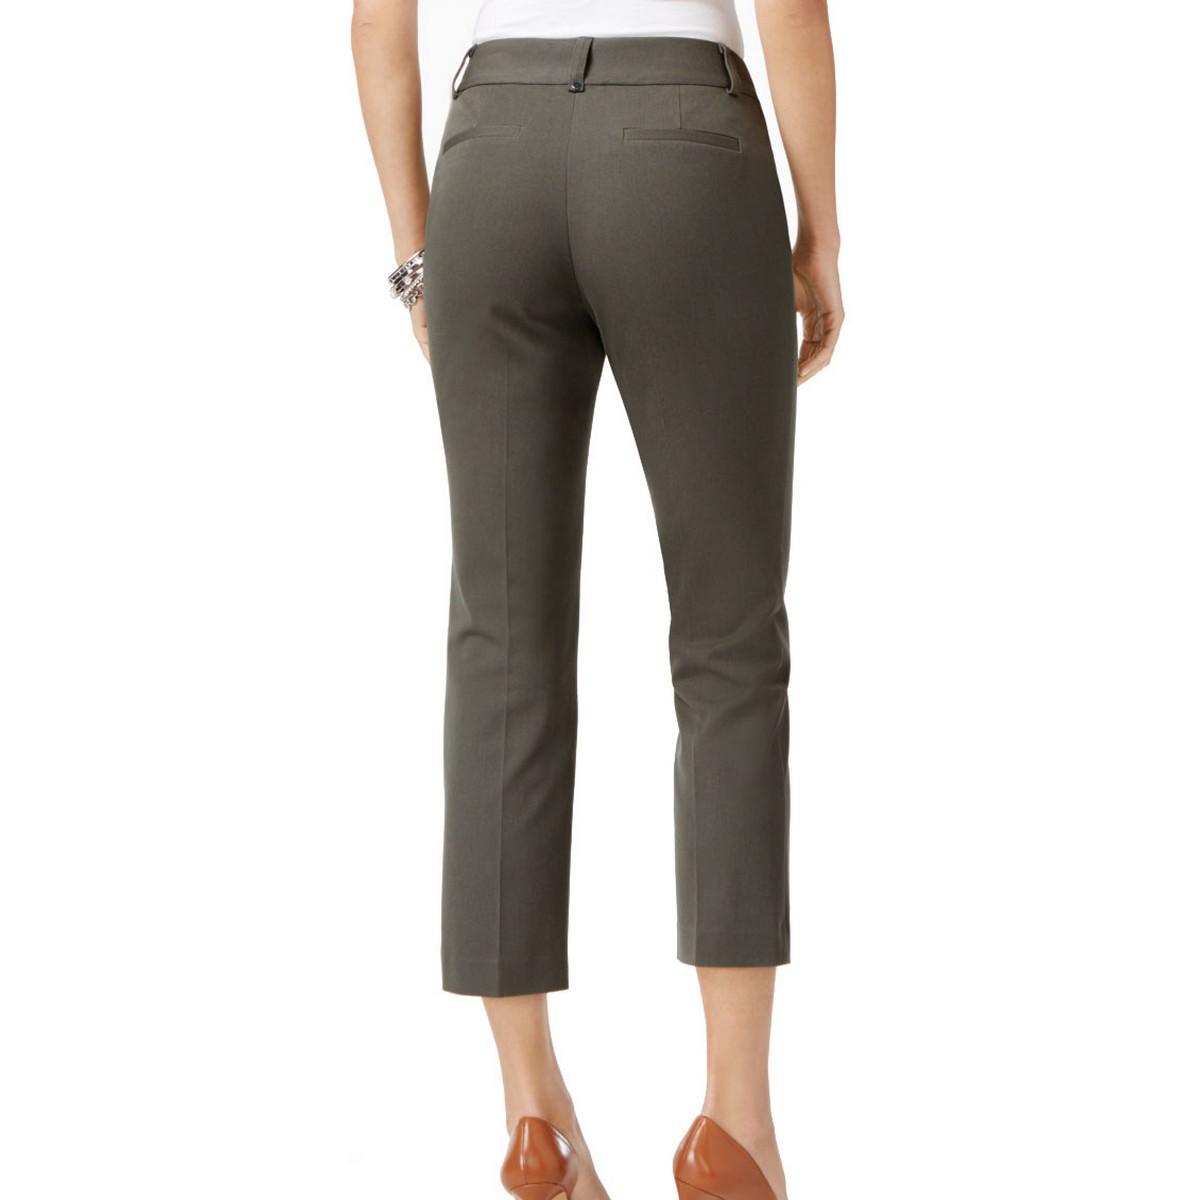 ALFANI-NEW-Women-039-s-Tummy-Control-Skinny-Capris-Cropped-Pants-TEDO thumbnail 4